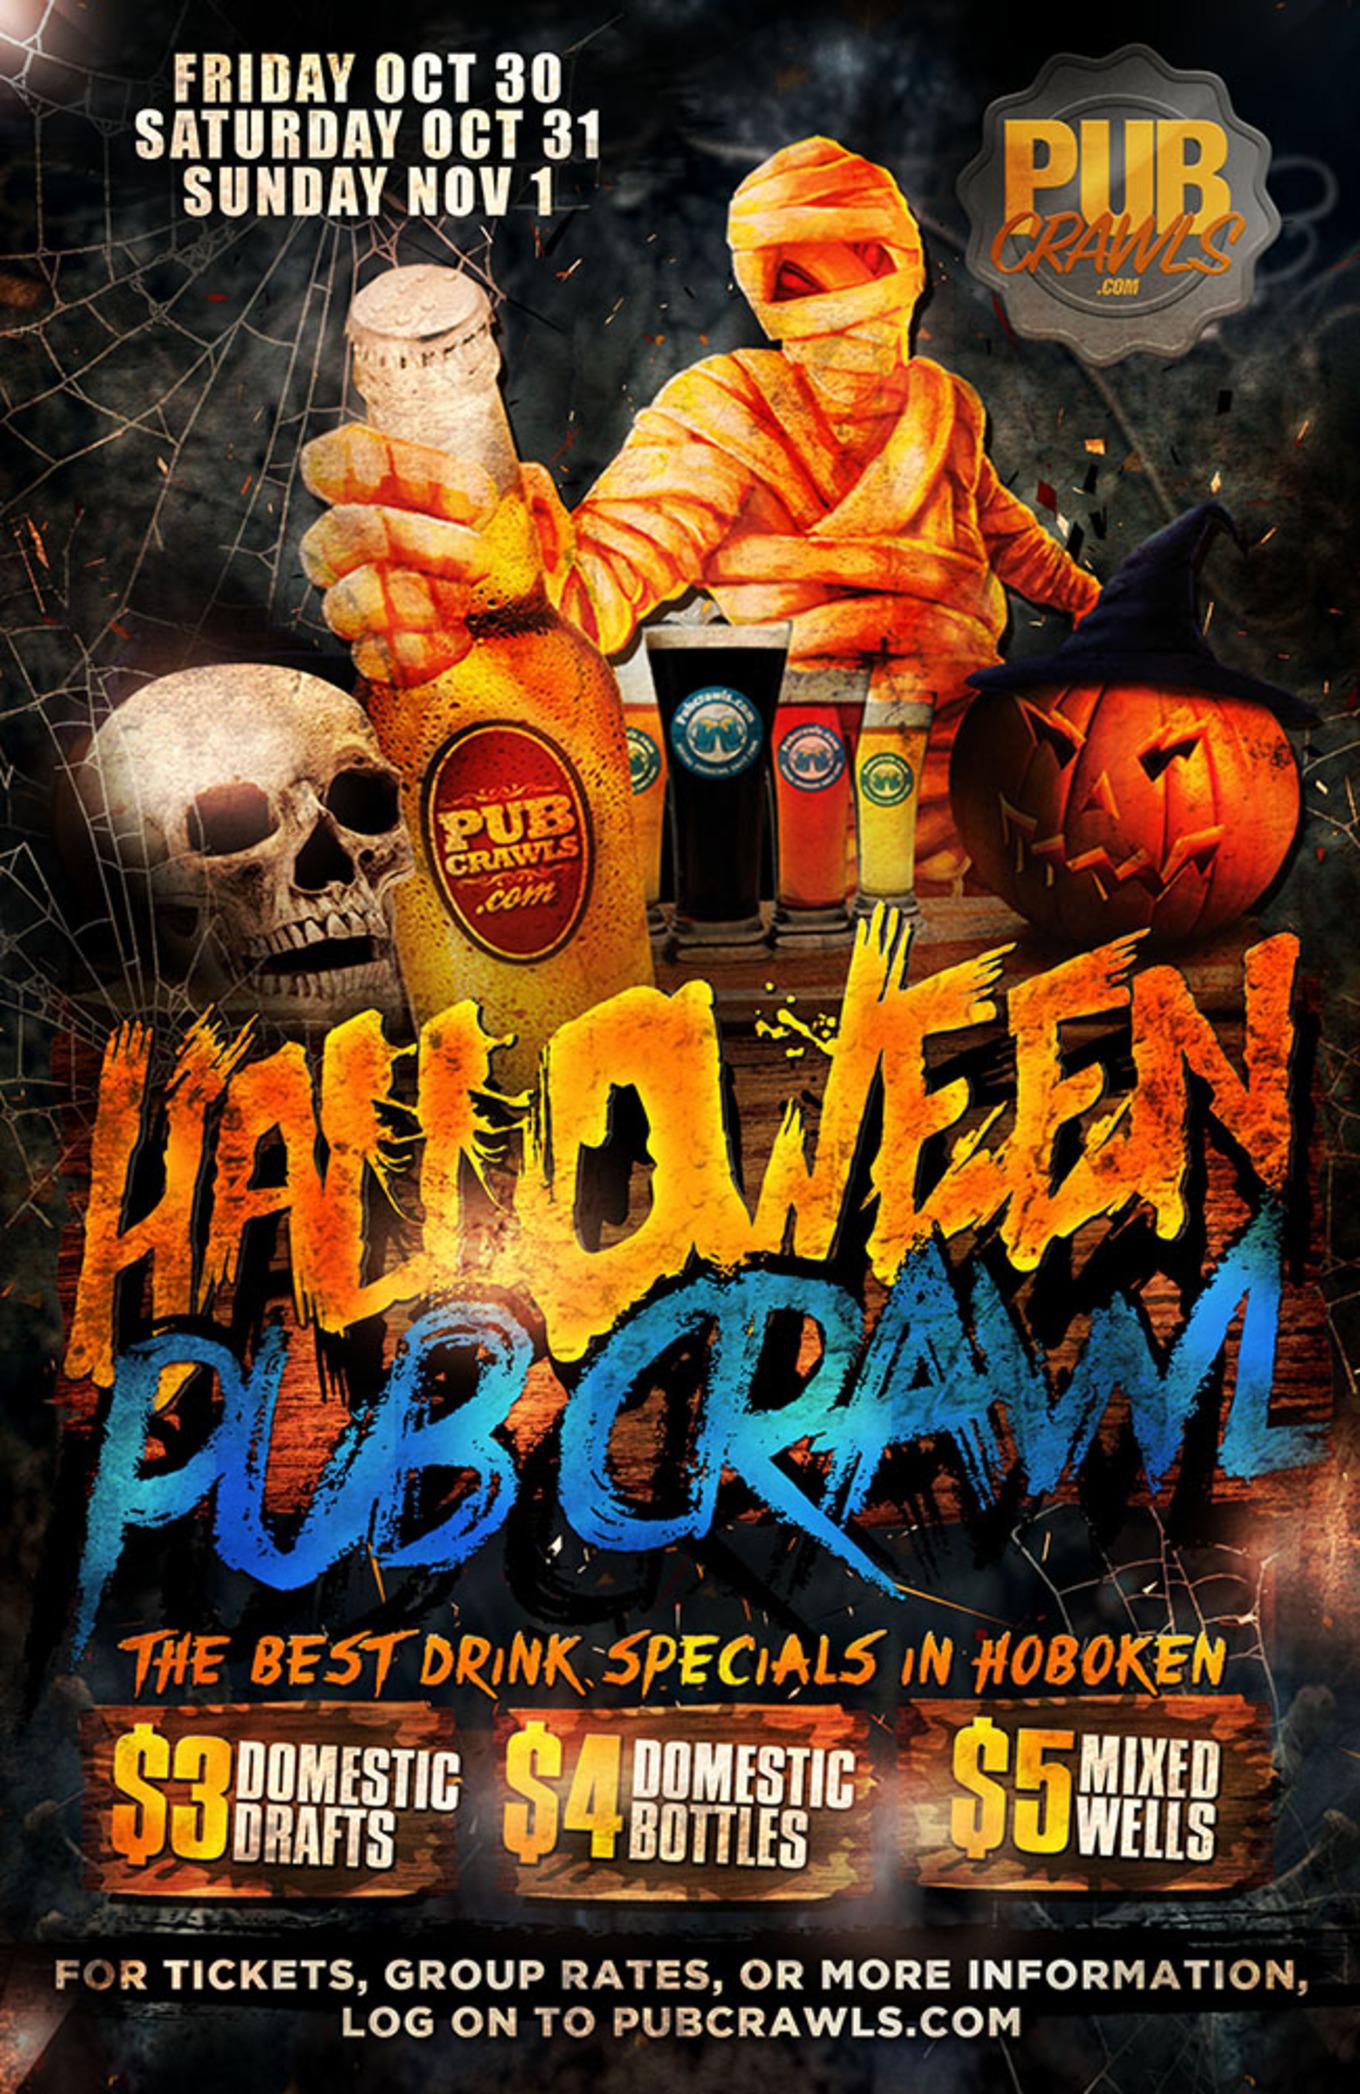 Hoboken Halloween 2020 Friday Official Hoboken Halloween Weekend Bar Crawl   Tickets   Texas